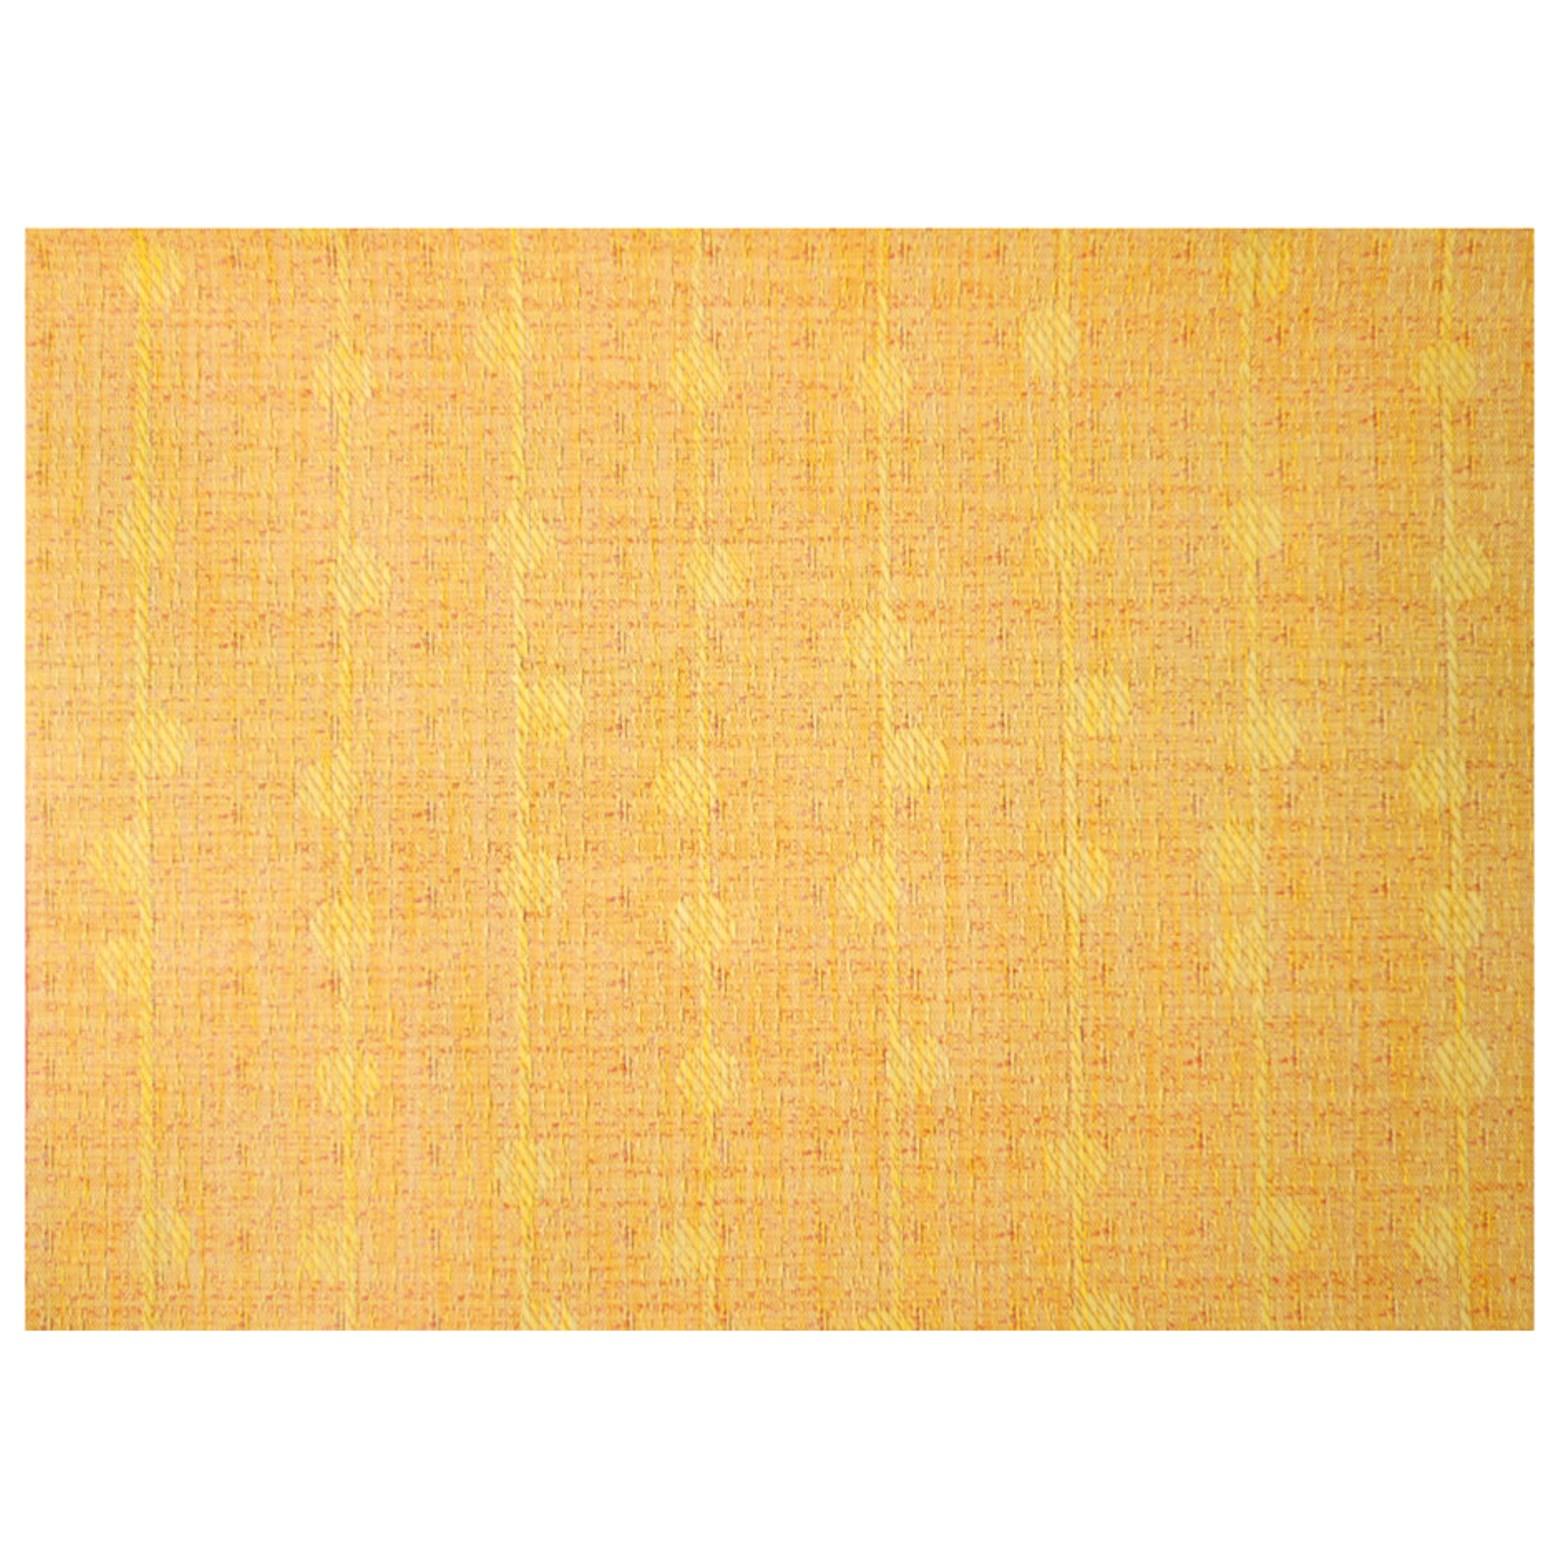 Онлайн каталог PROMENU: Подставка под тарелку Winkler BUBBLE, 33х45 см, оранжевый                               8682 040 000